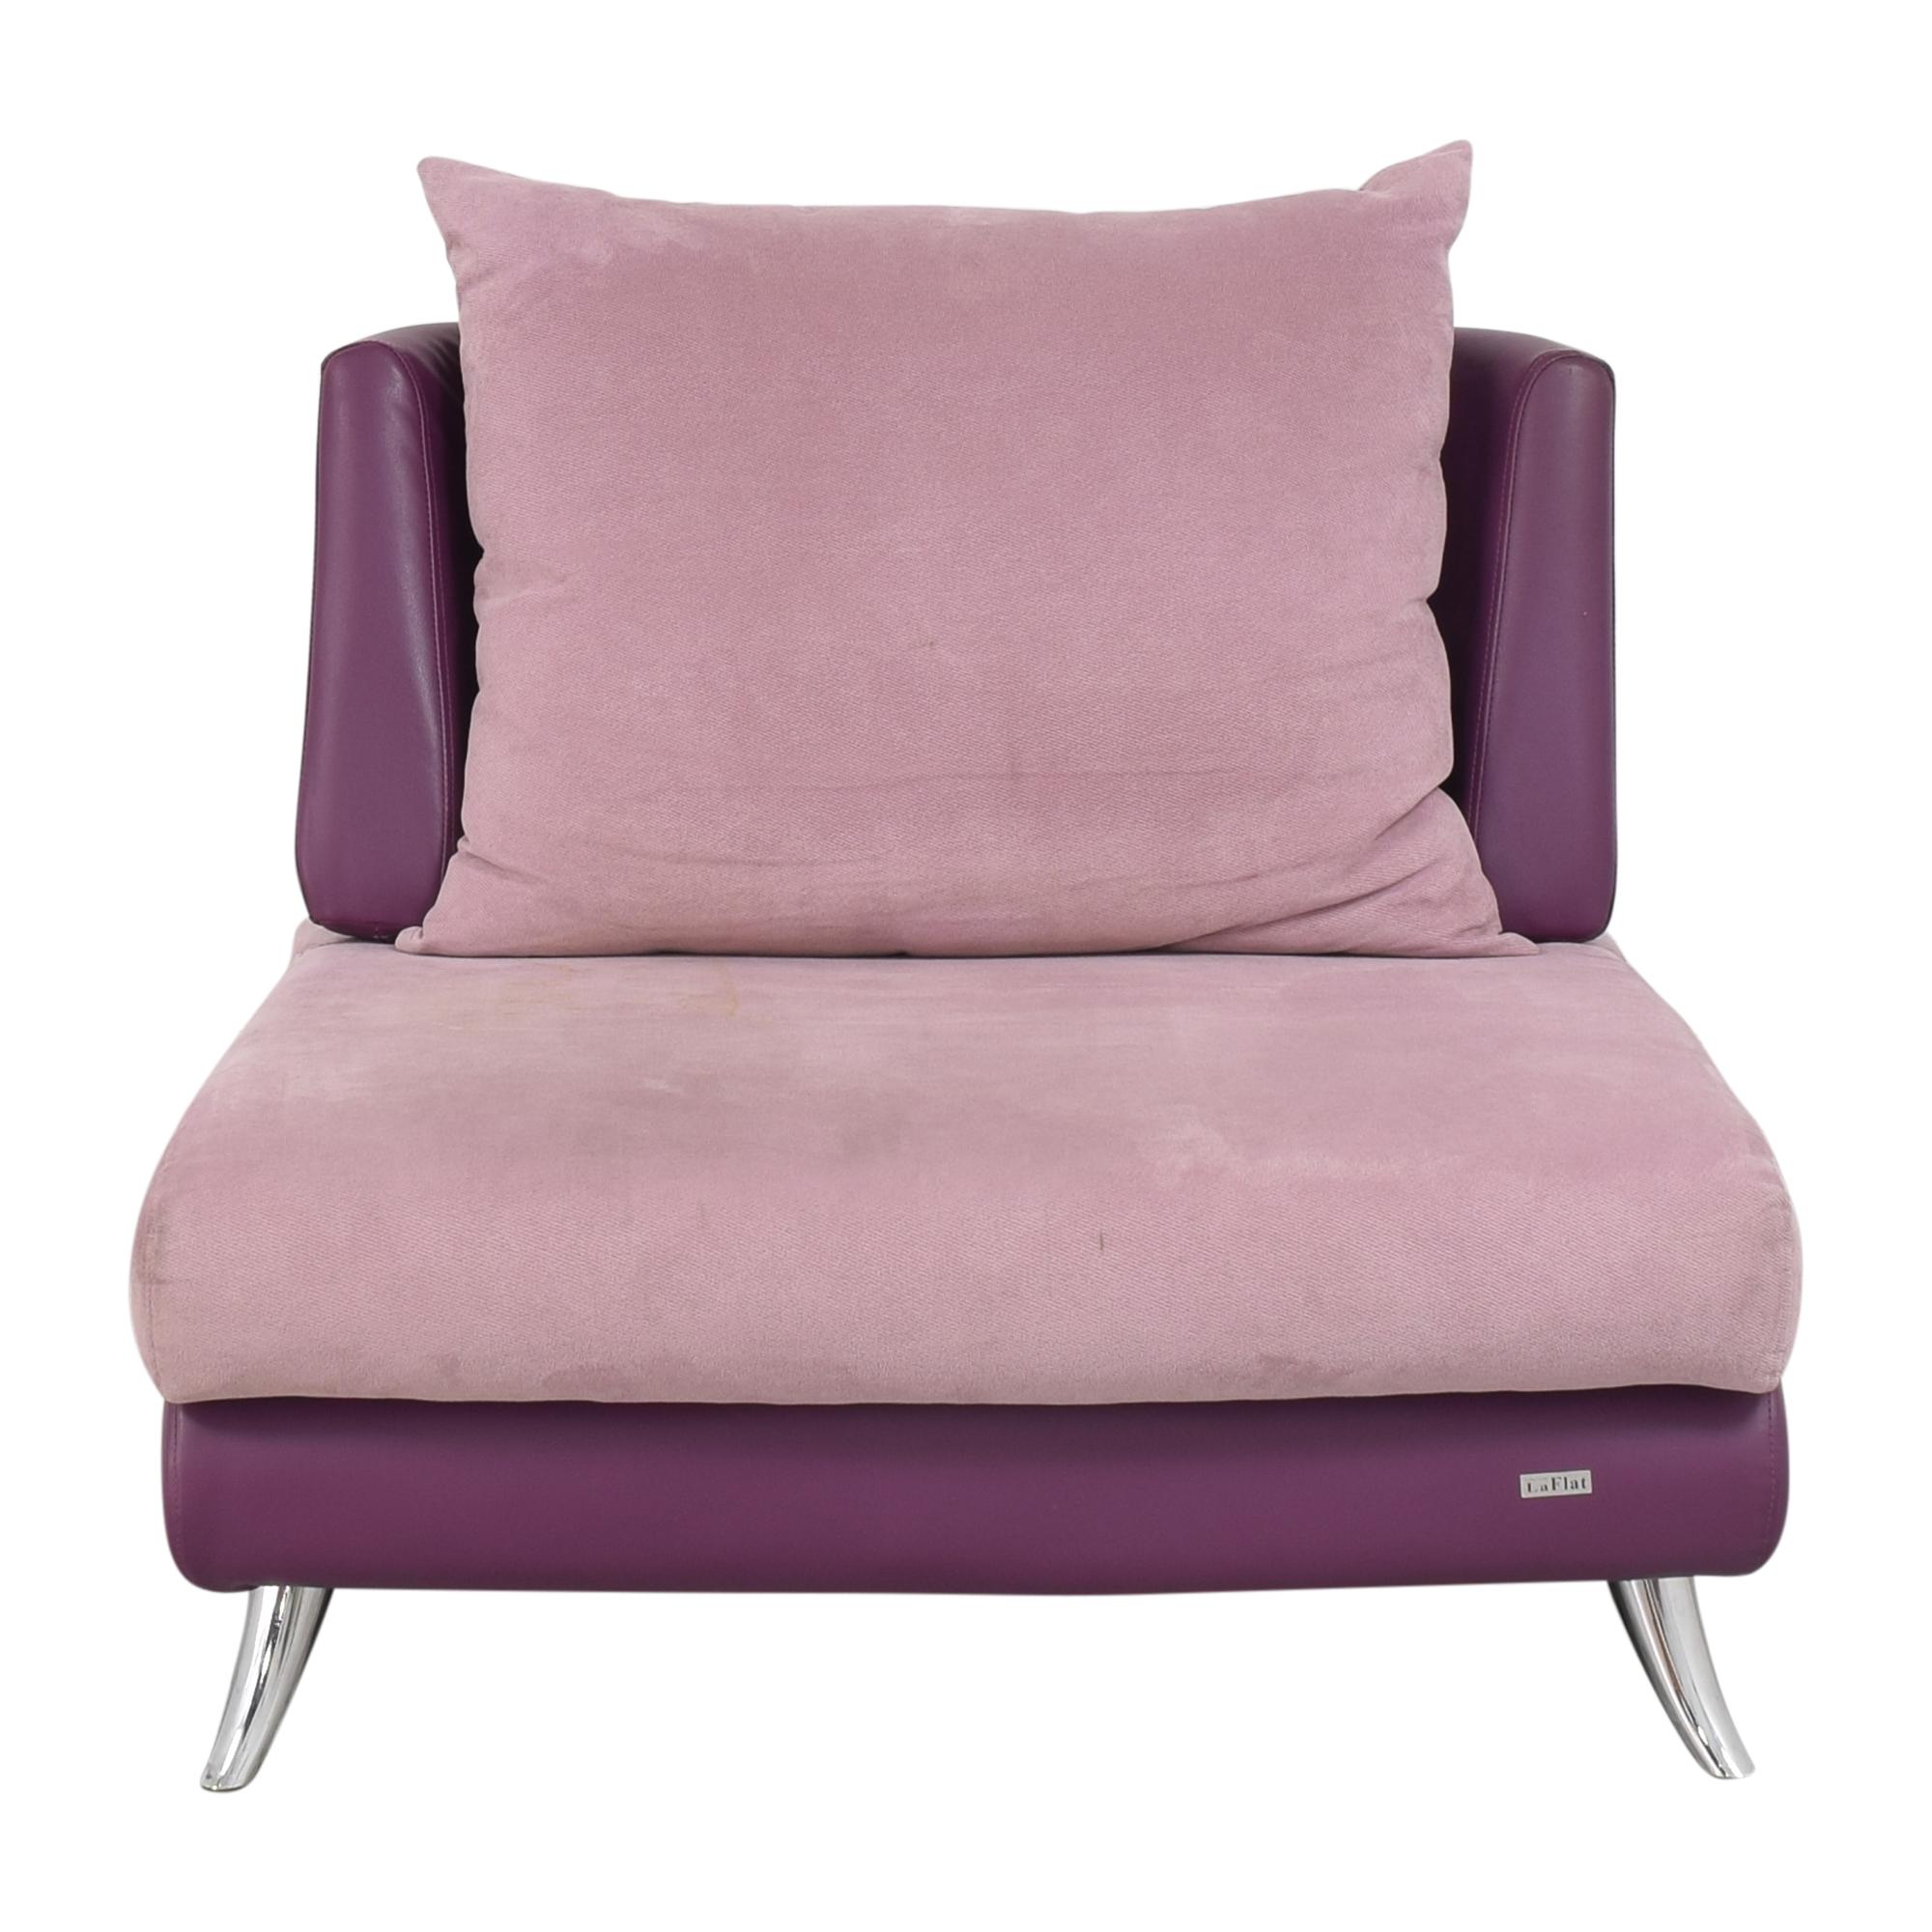 LaFlat Modern Accent Chair sale